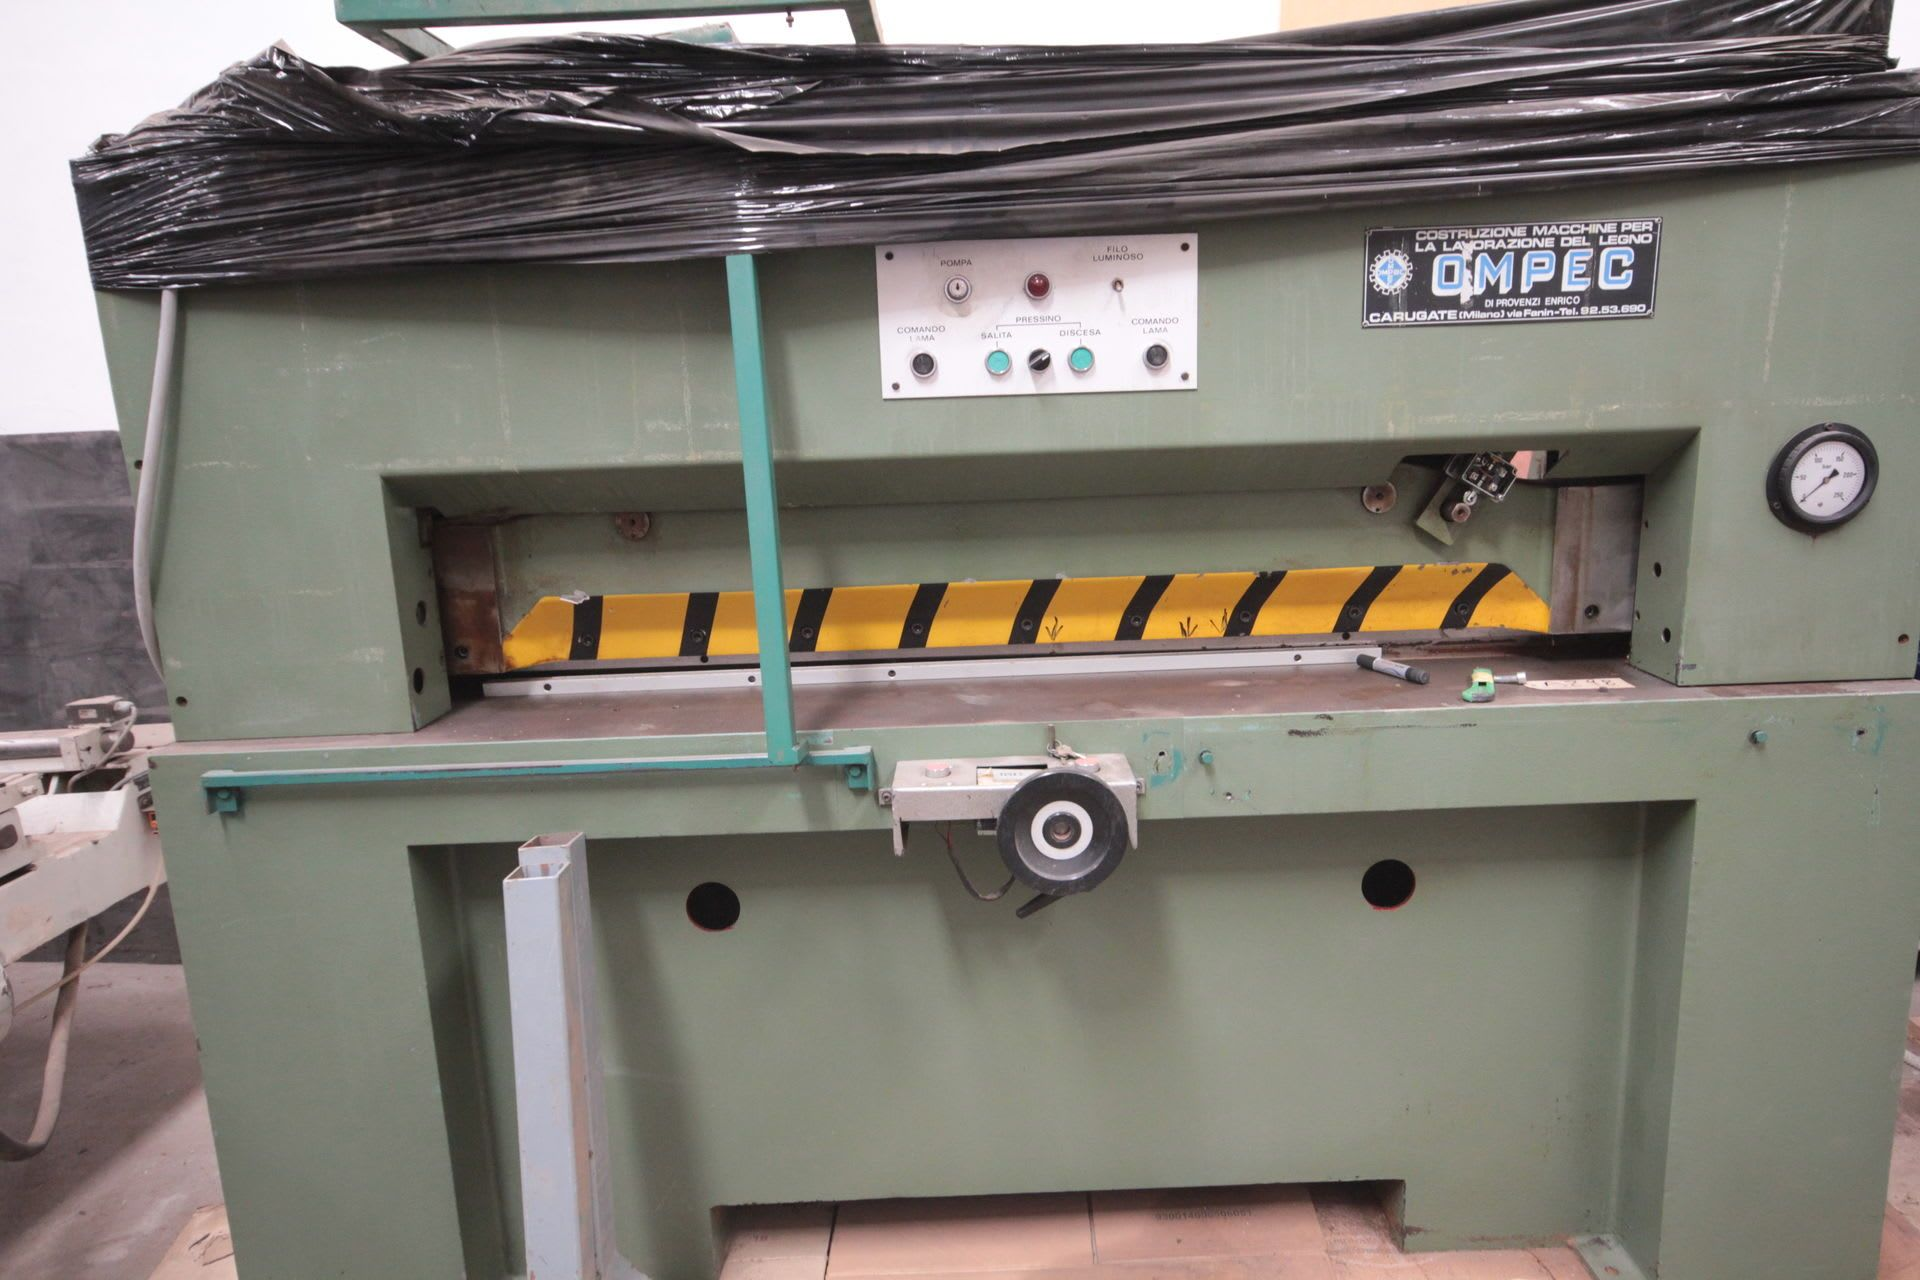 OMPEC Furnierschneidemaschine